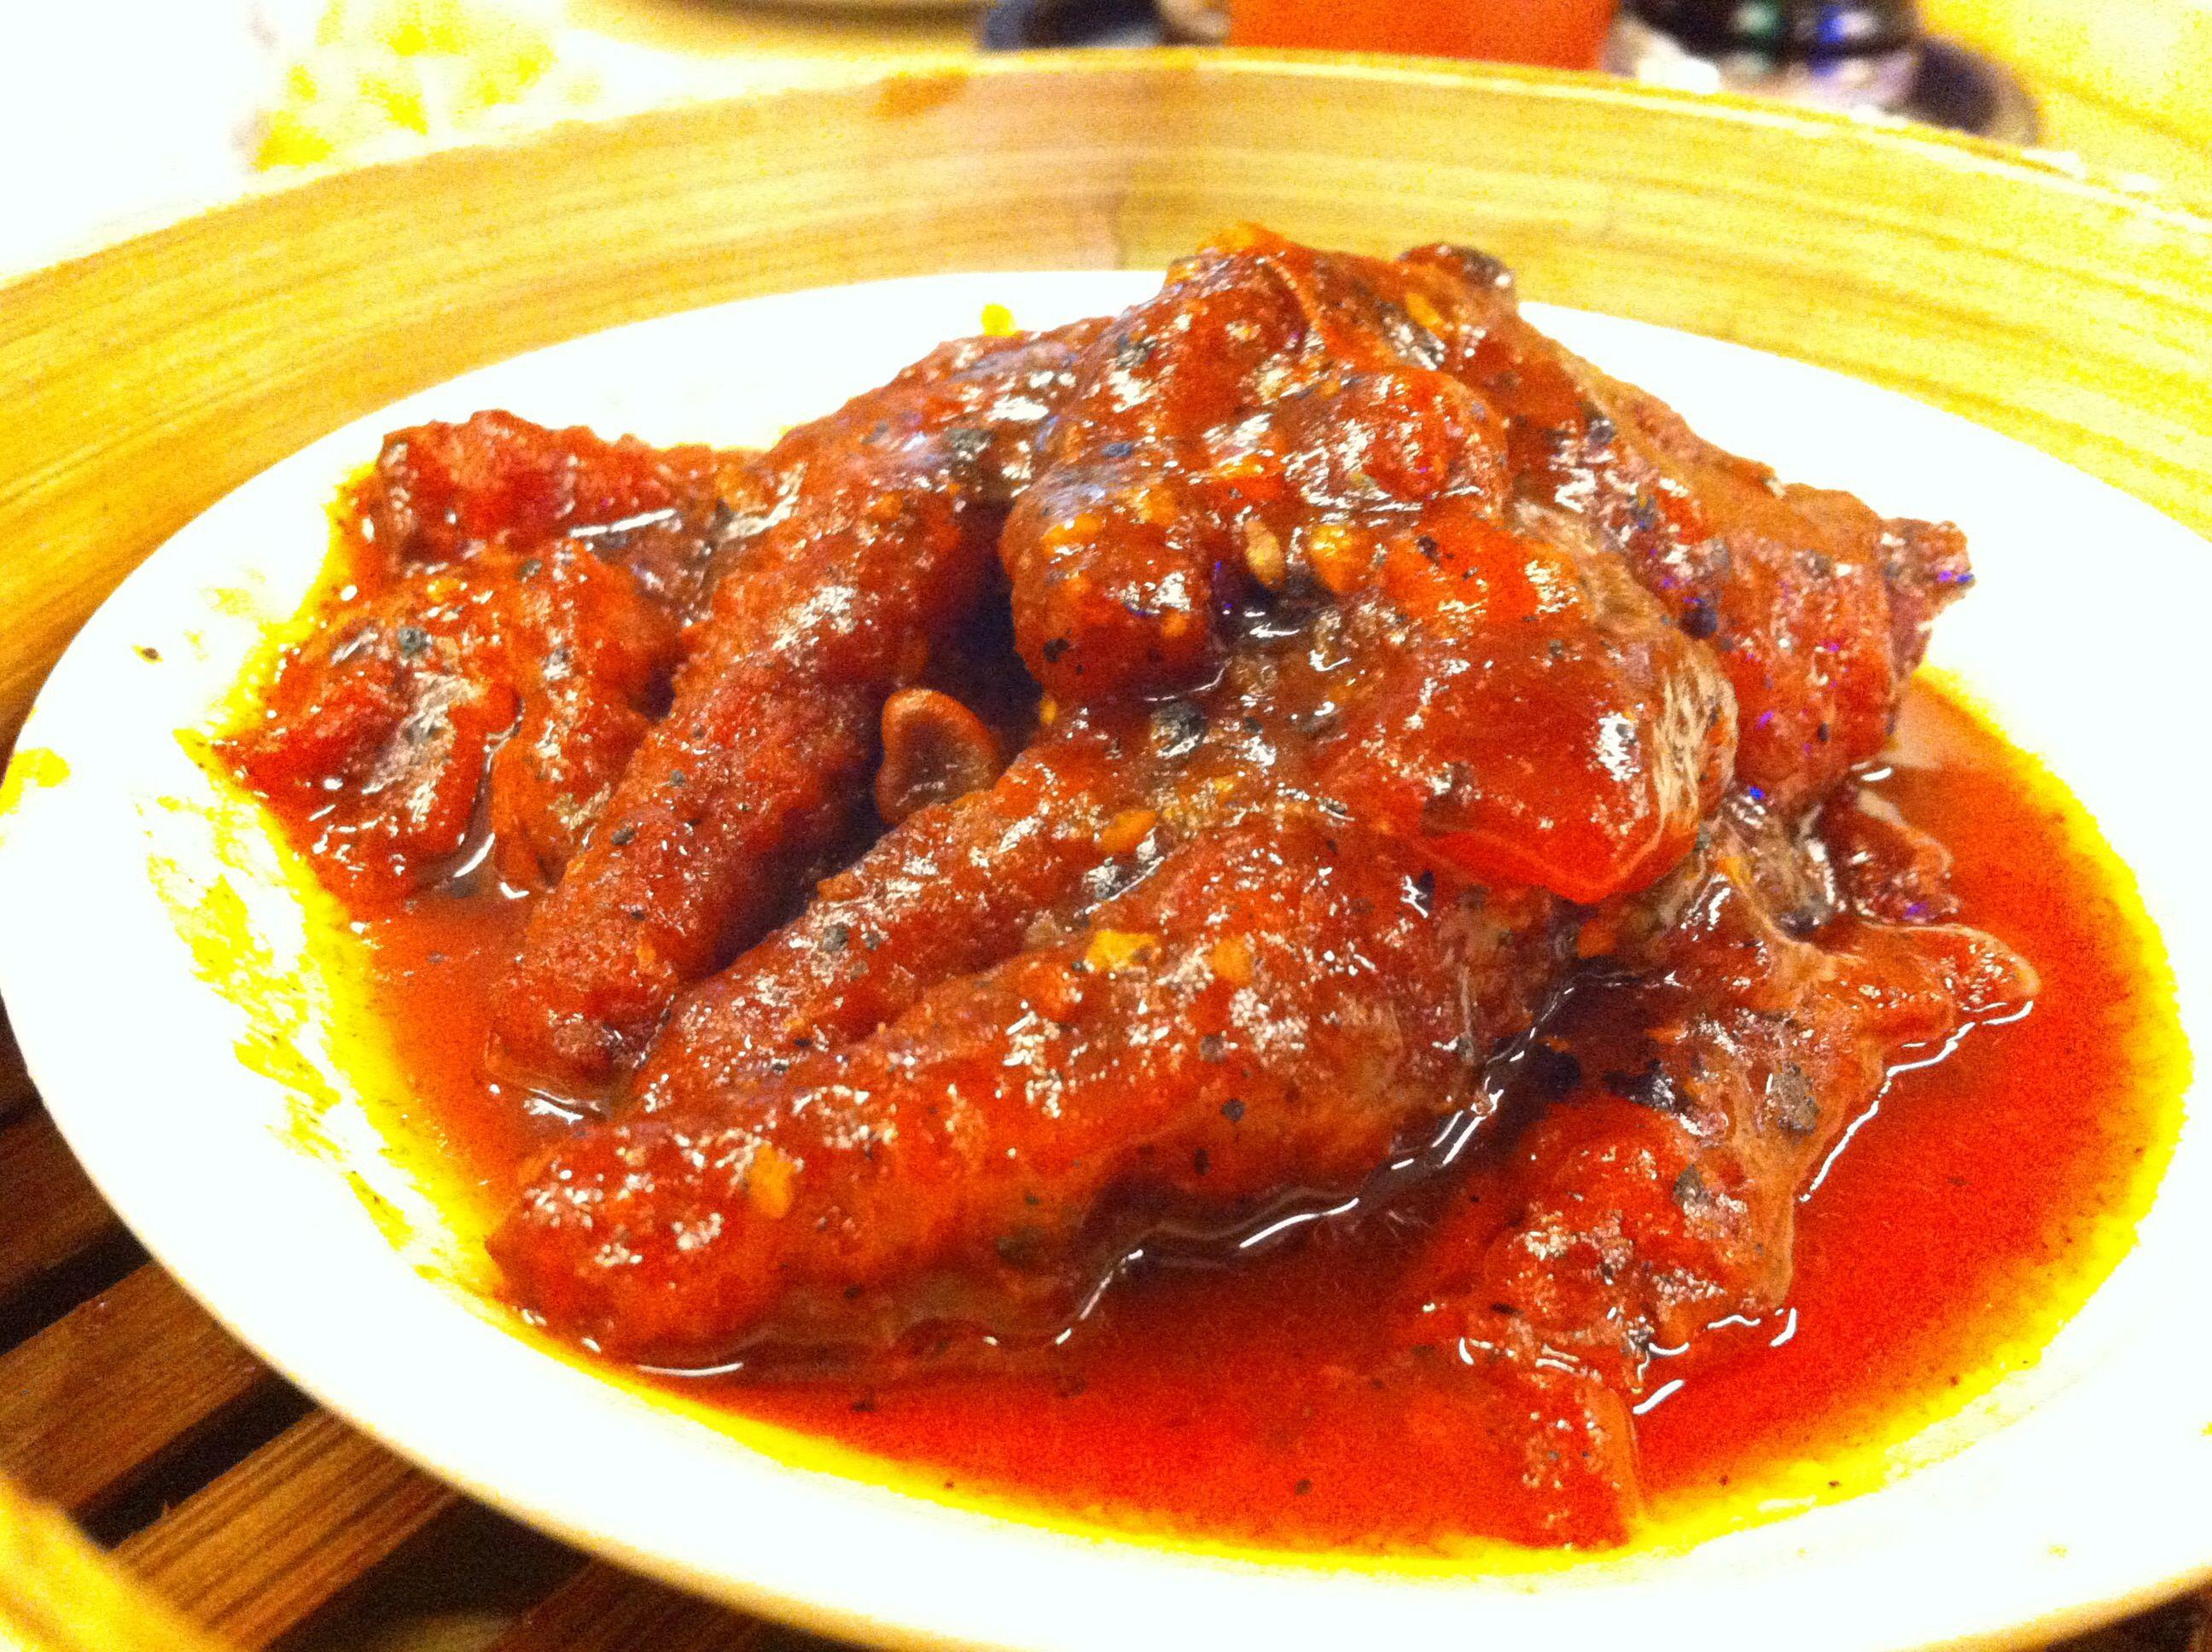 Fong Zau Steam Chicken Feet At Imperial Kitchen Dimsum Jakarta Indonesia Ayam